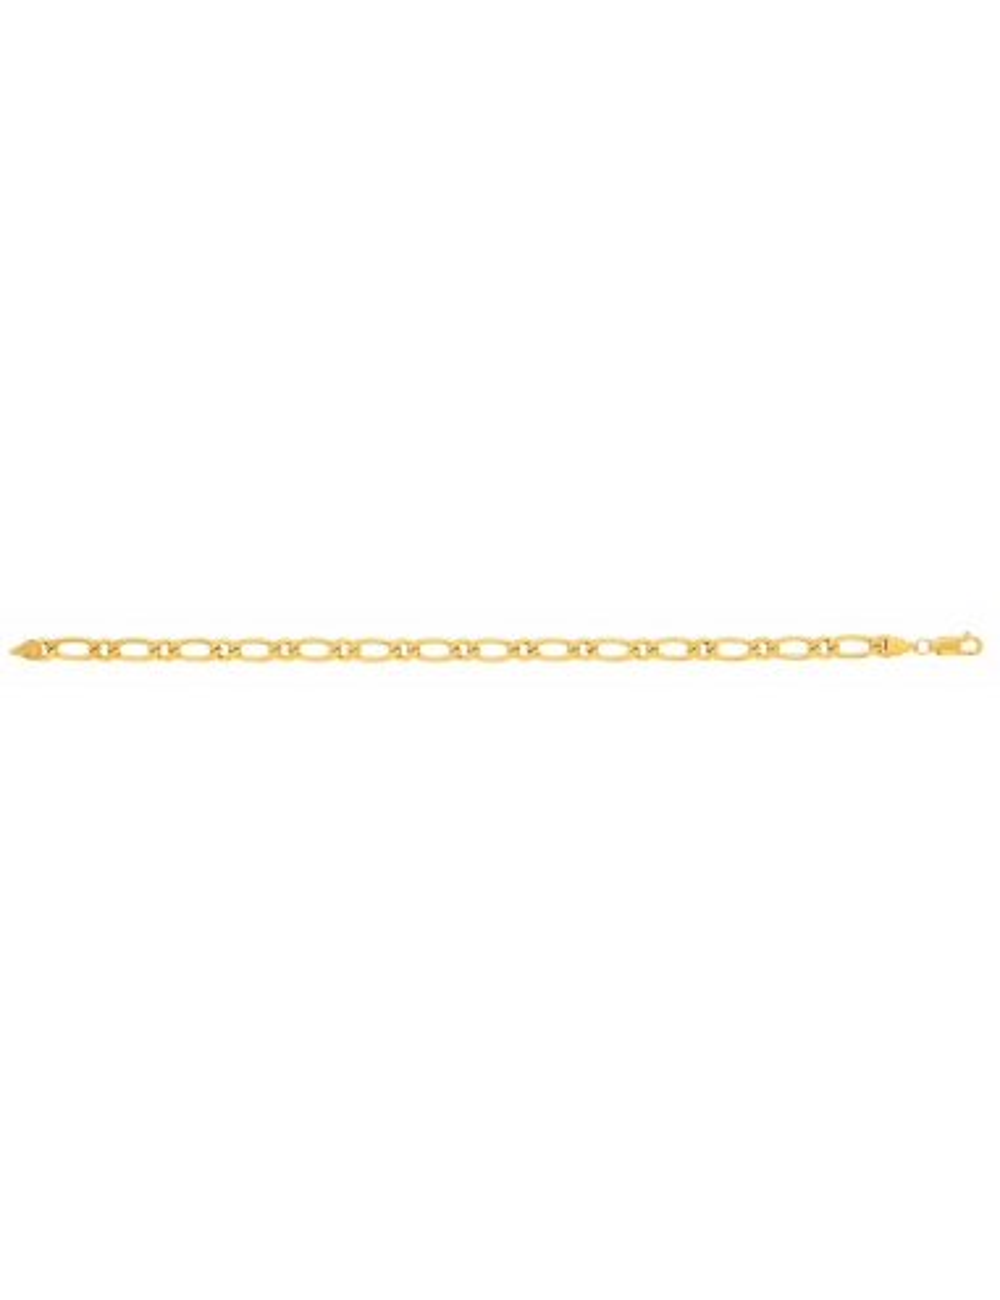 Bracelet Maille Alternée 1/1 Or Jaune 18 Carats